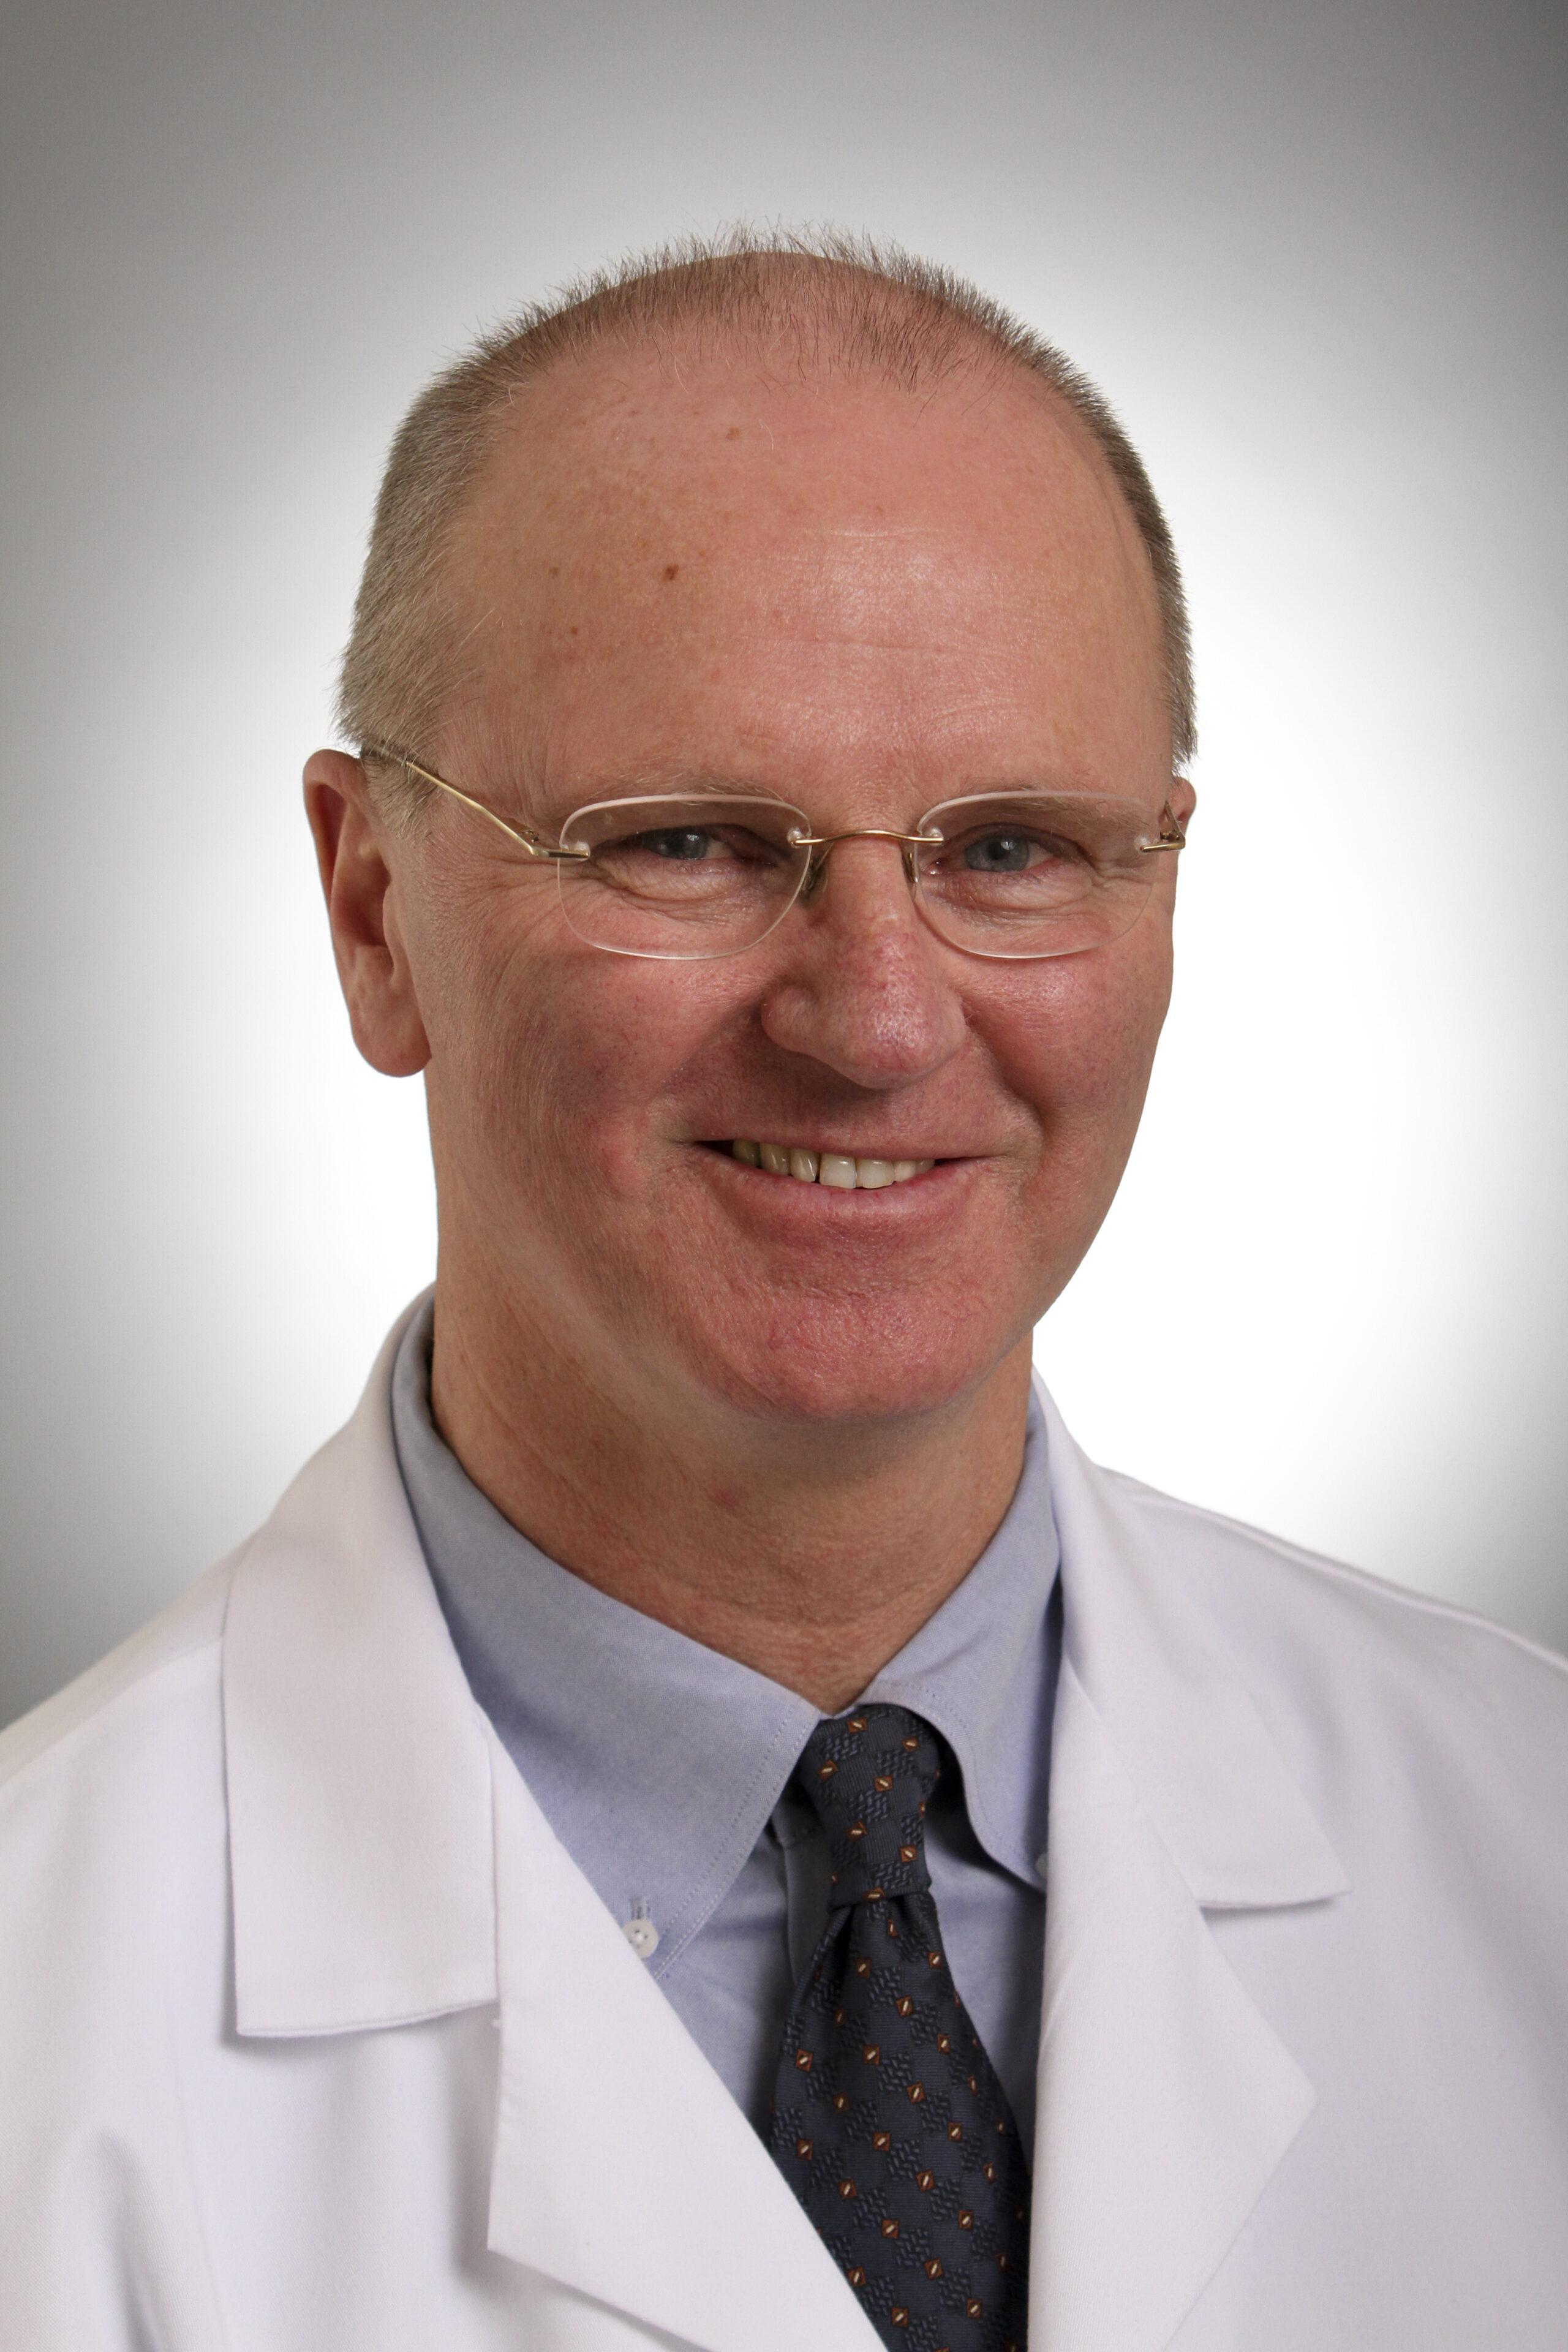 Peter Coleman, M.D.